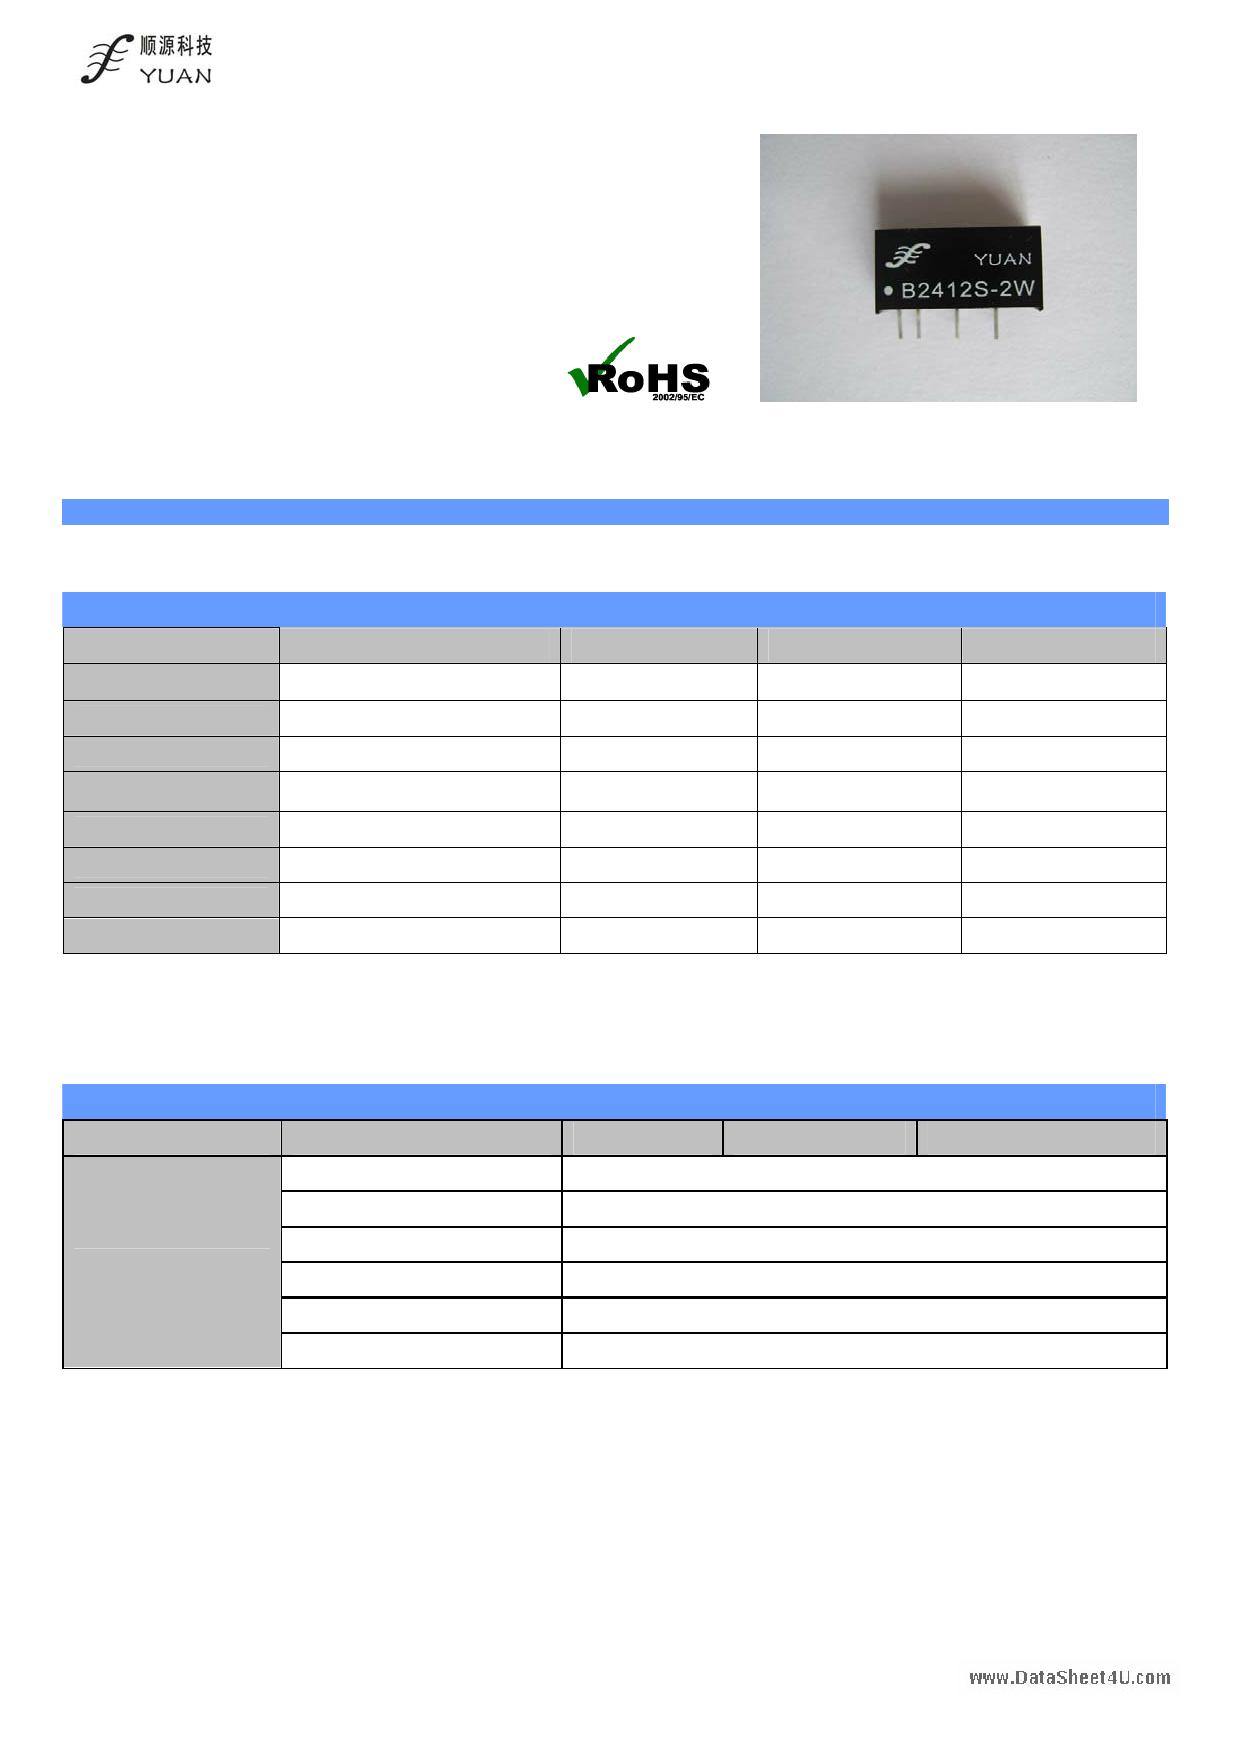 B0503D-2W datasheet